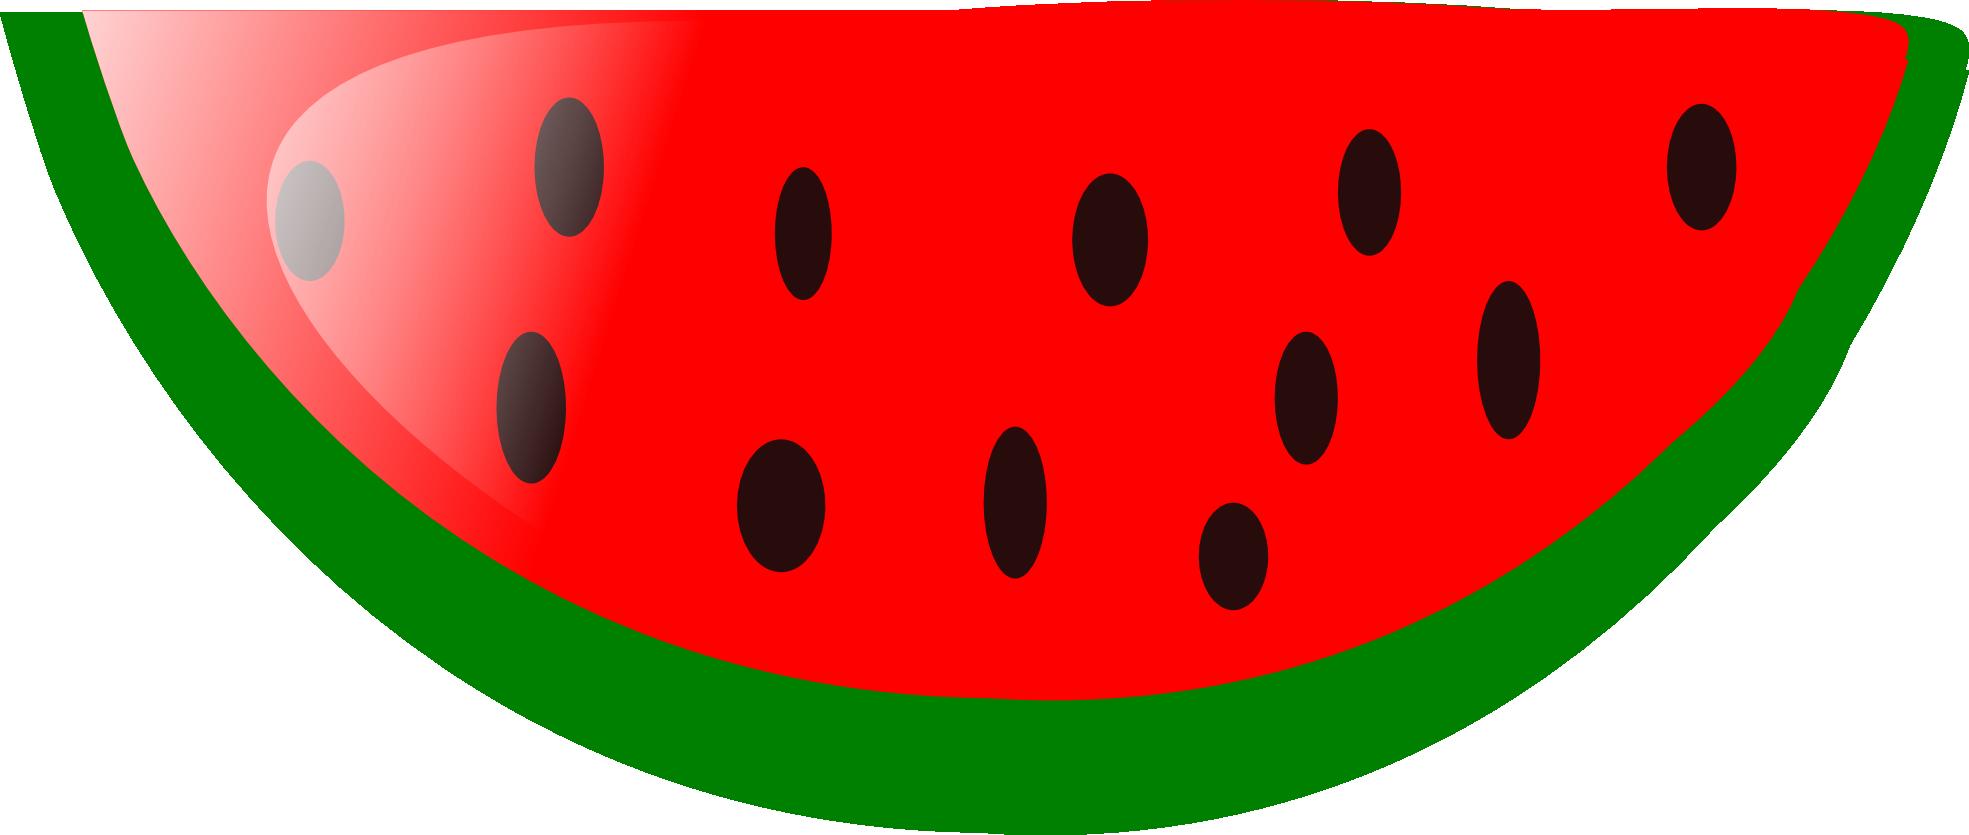 Watermelon clip art border free clipart images 4 clipartandscrap